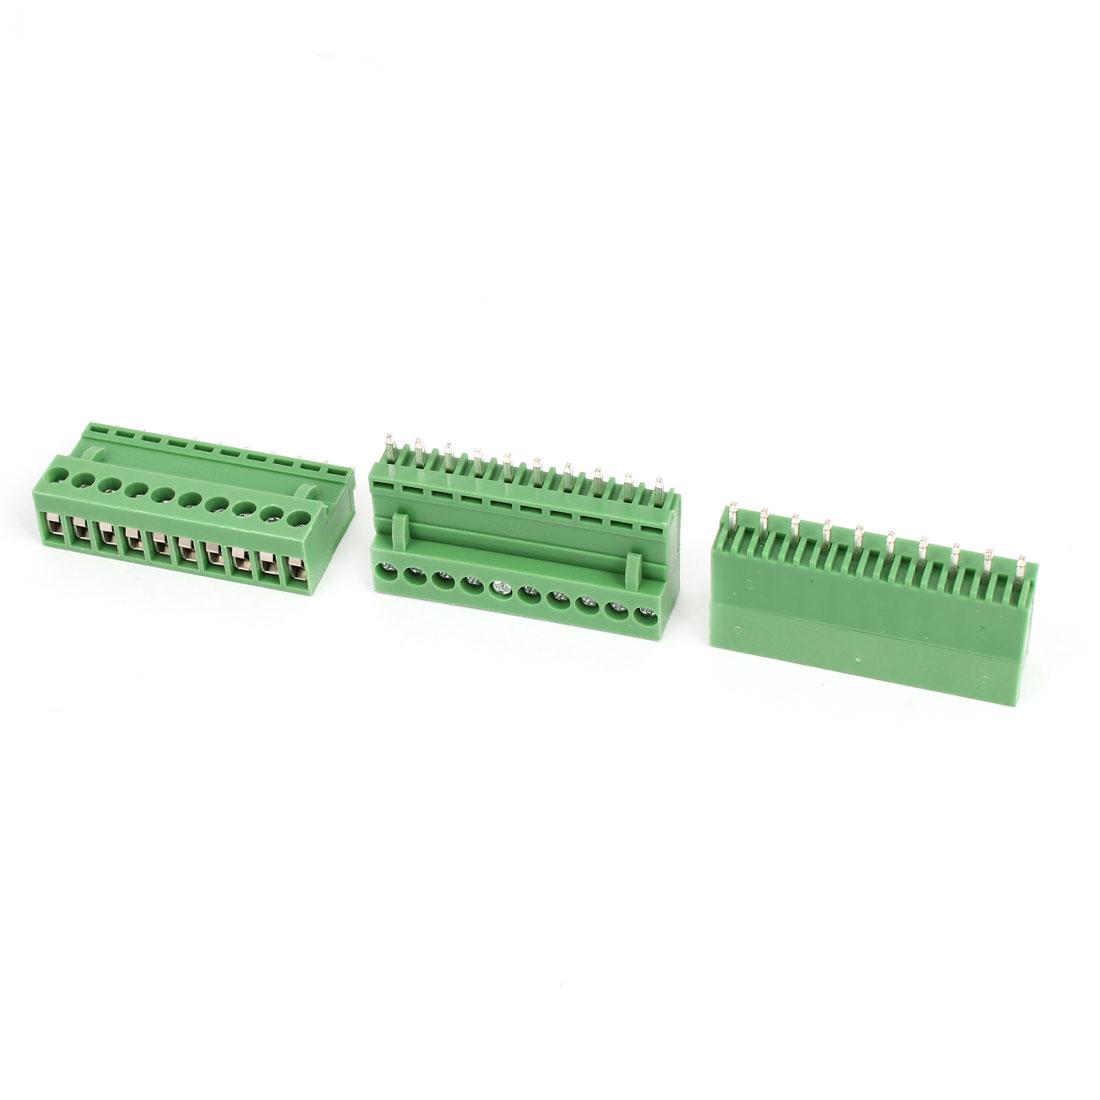 3 Pcs AC 300V 10A 10P Pins PCB Screw Terminal Block Connector 3.96mm Pitch Green